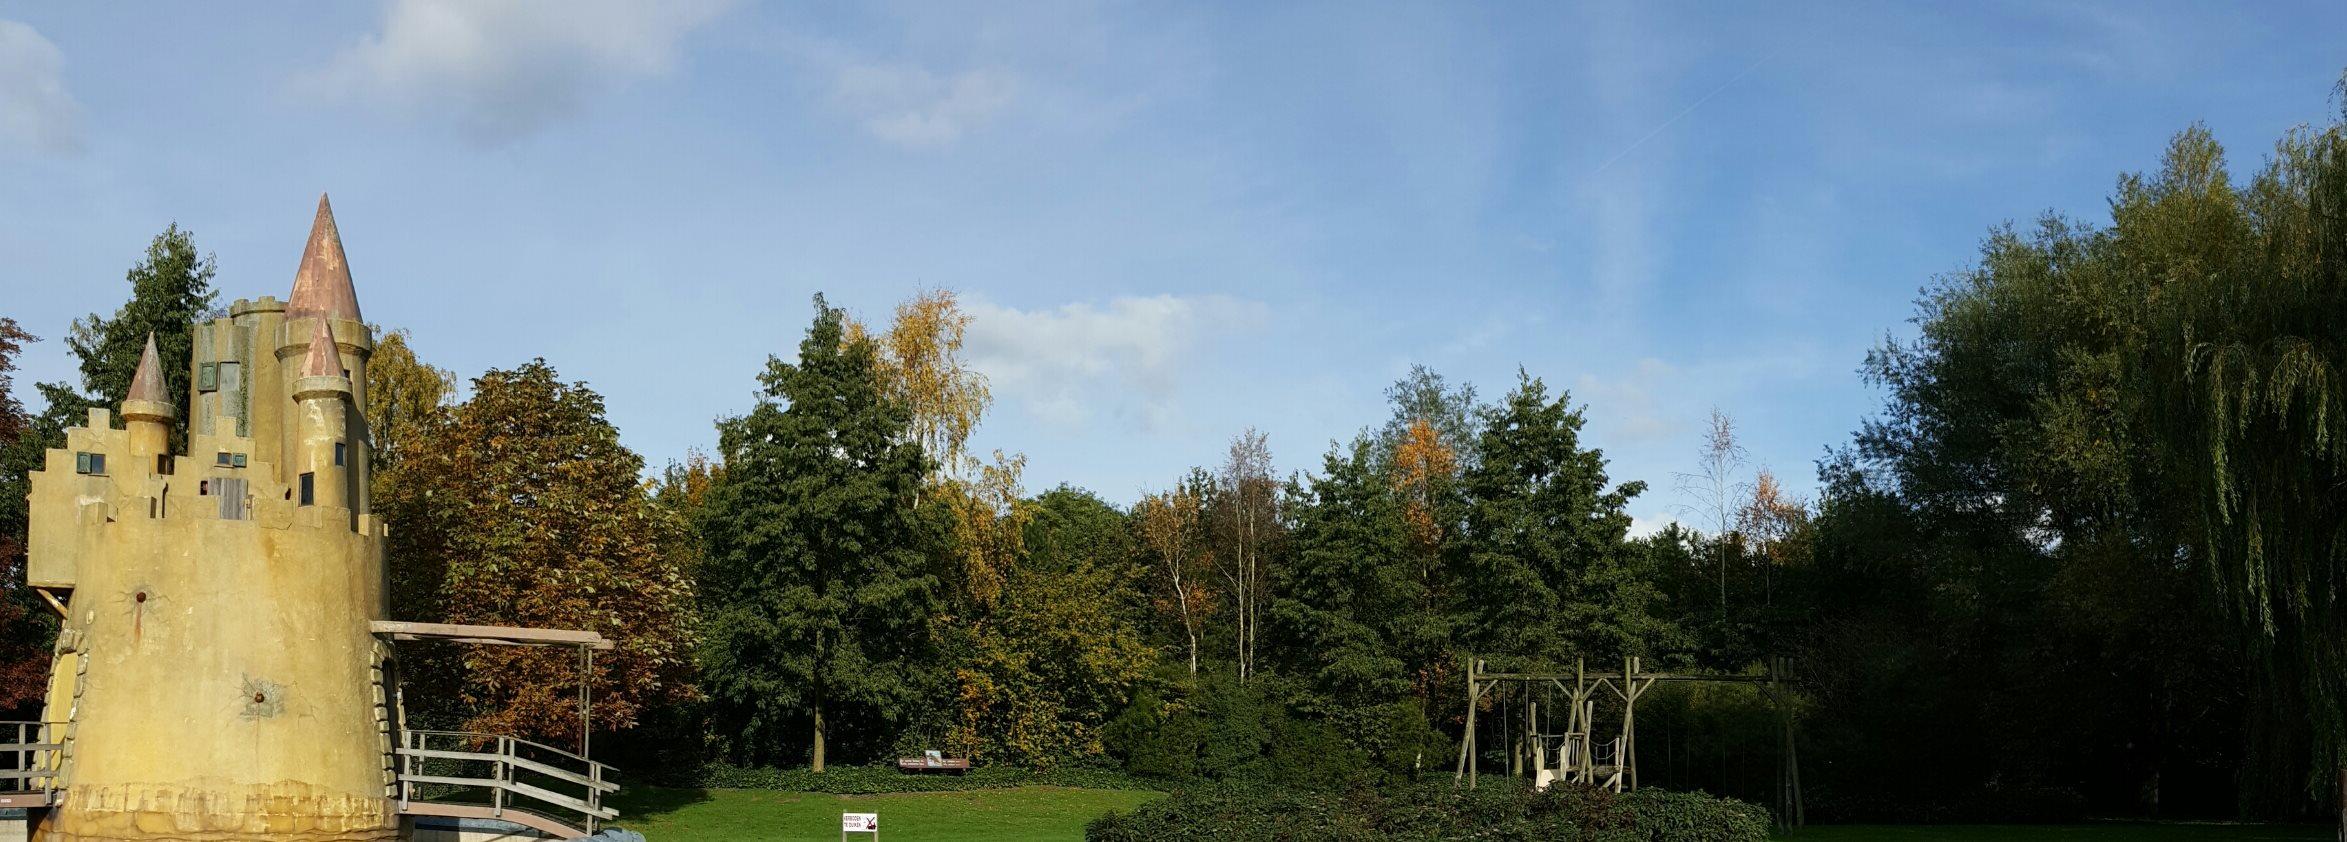 Reynaertland-banner